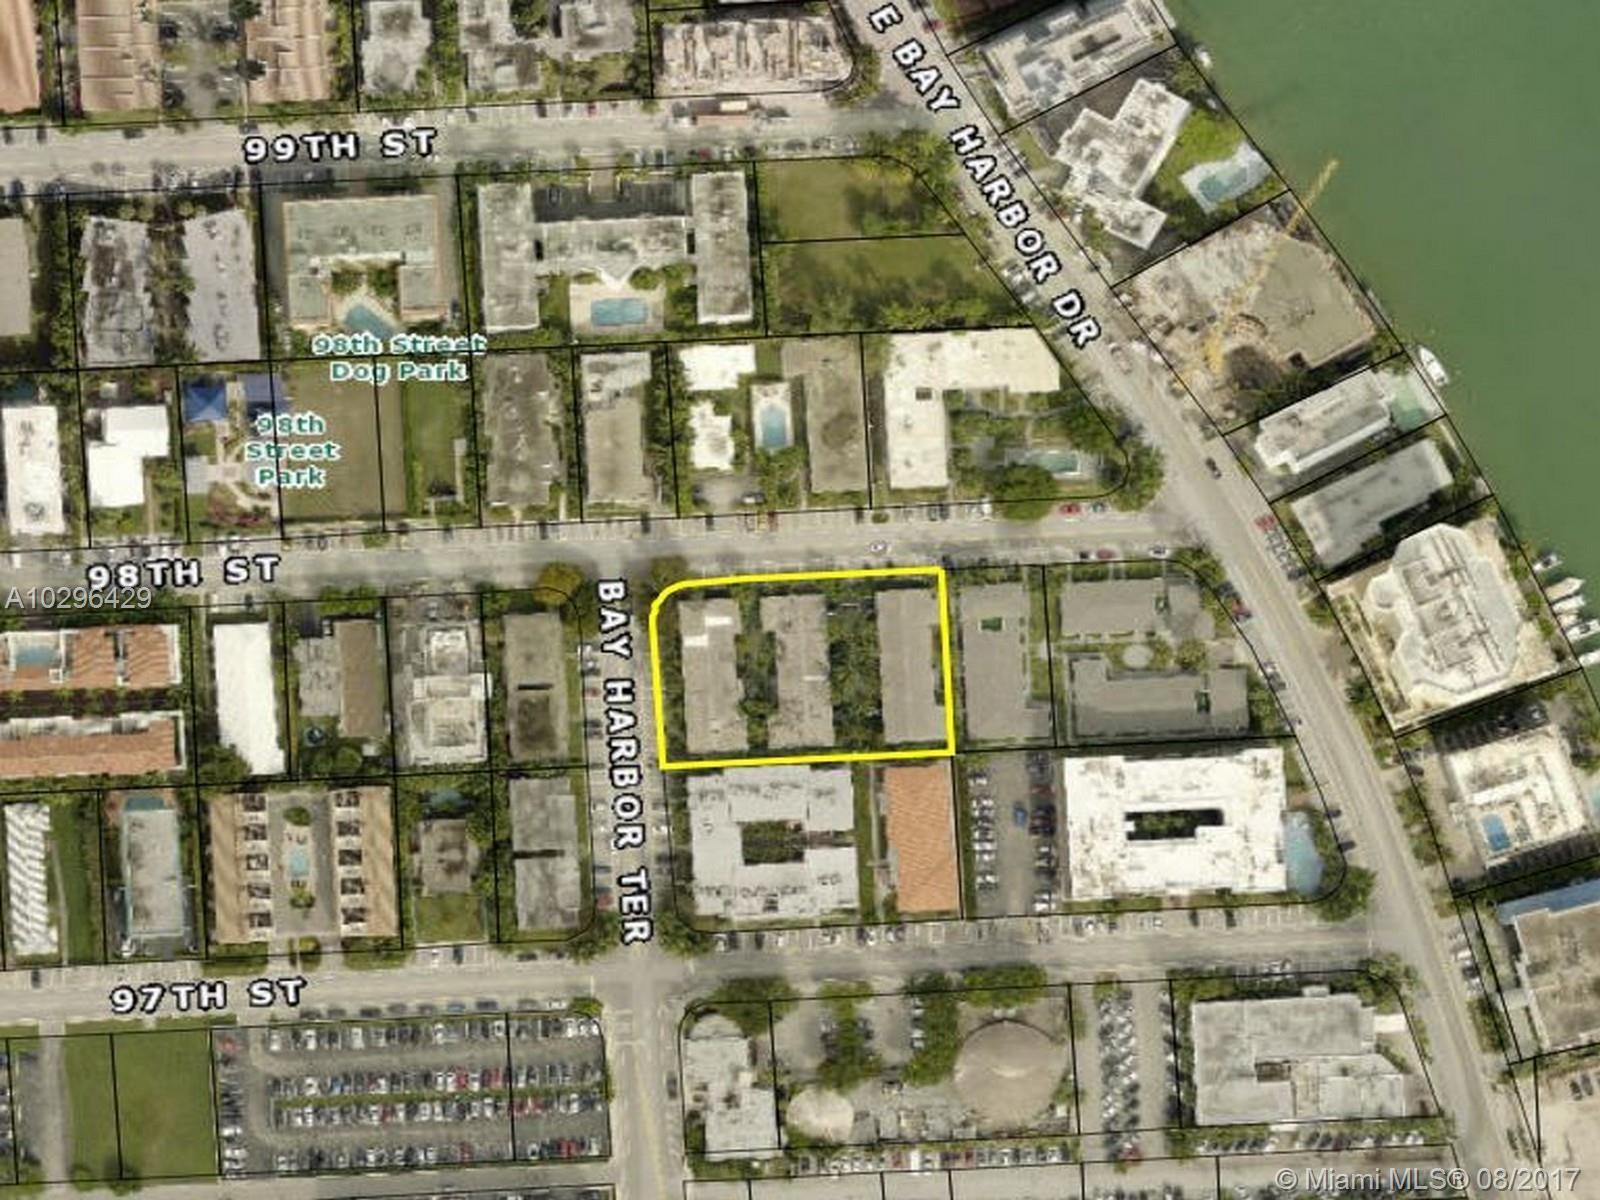 1070 98 St, Bay Harbor Islands, FL 33154 - Bay Harbor Islands, FL real estate listing